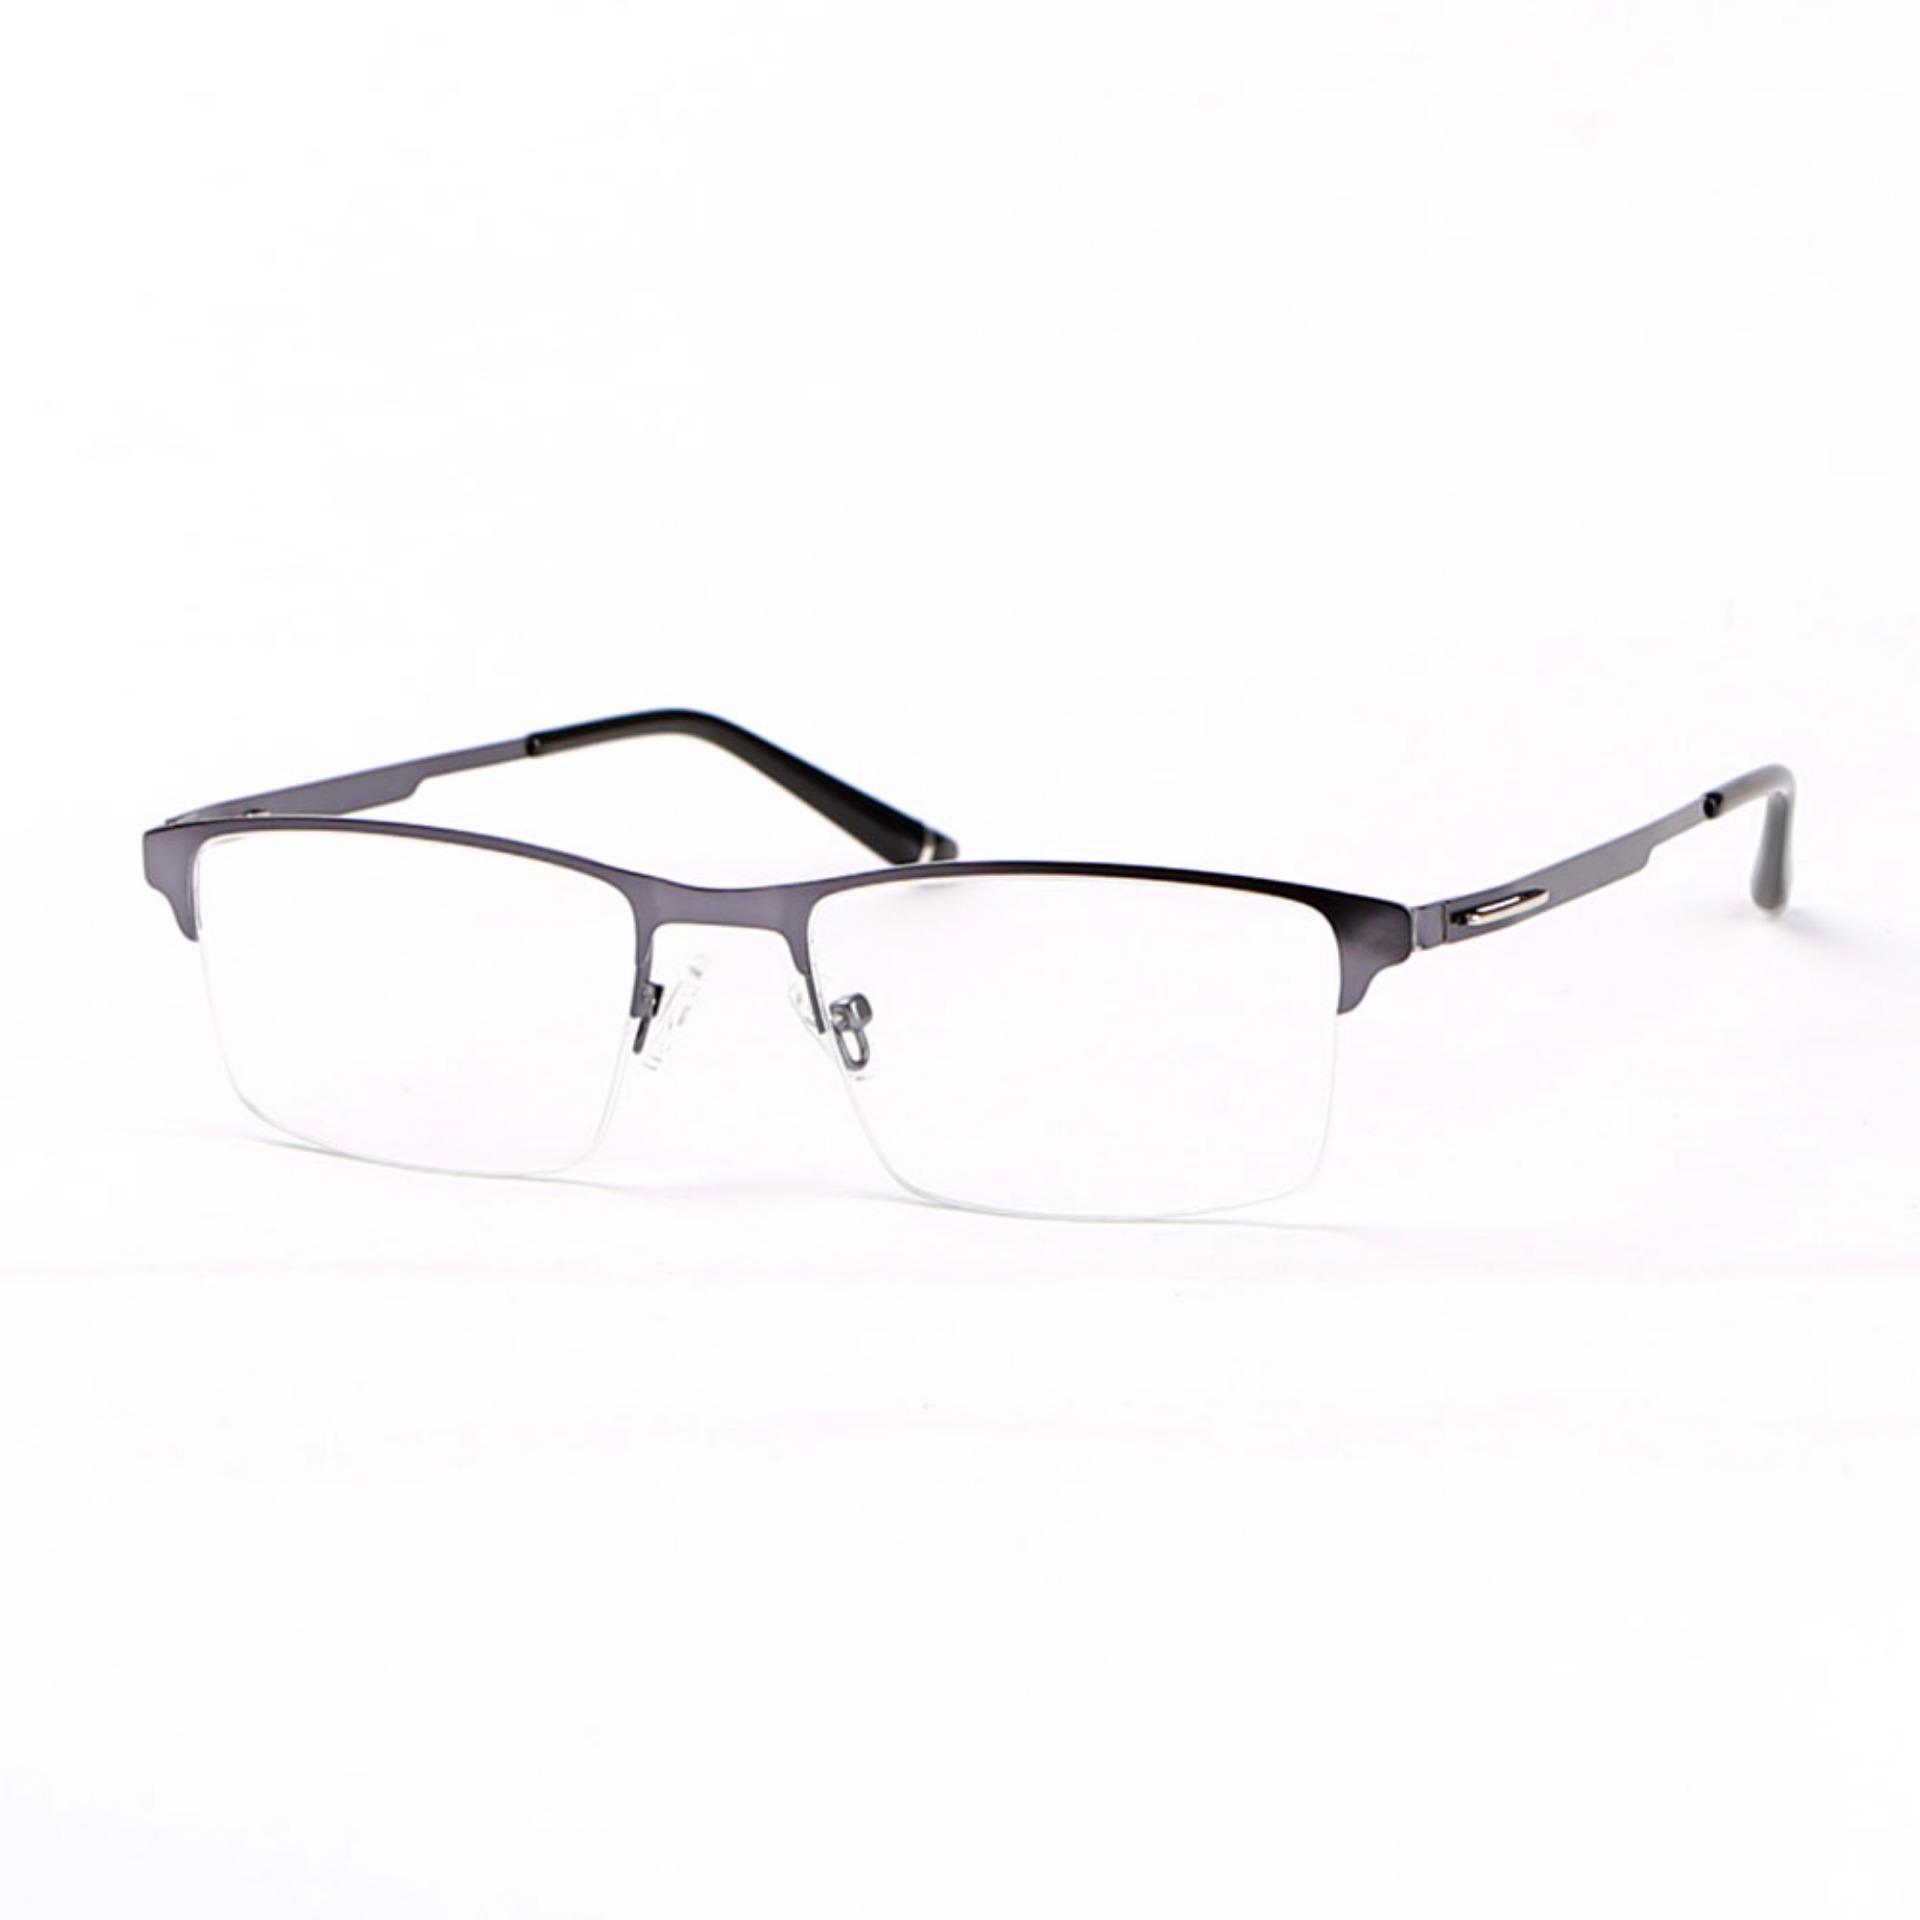 e60ca6ebae9 Feelz Optical Myopia Frame Metal Glasses Fashion Spectacle Eyewear Alloy  Cat Eye Eyeglasses .